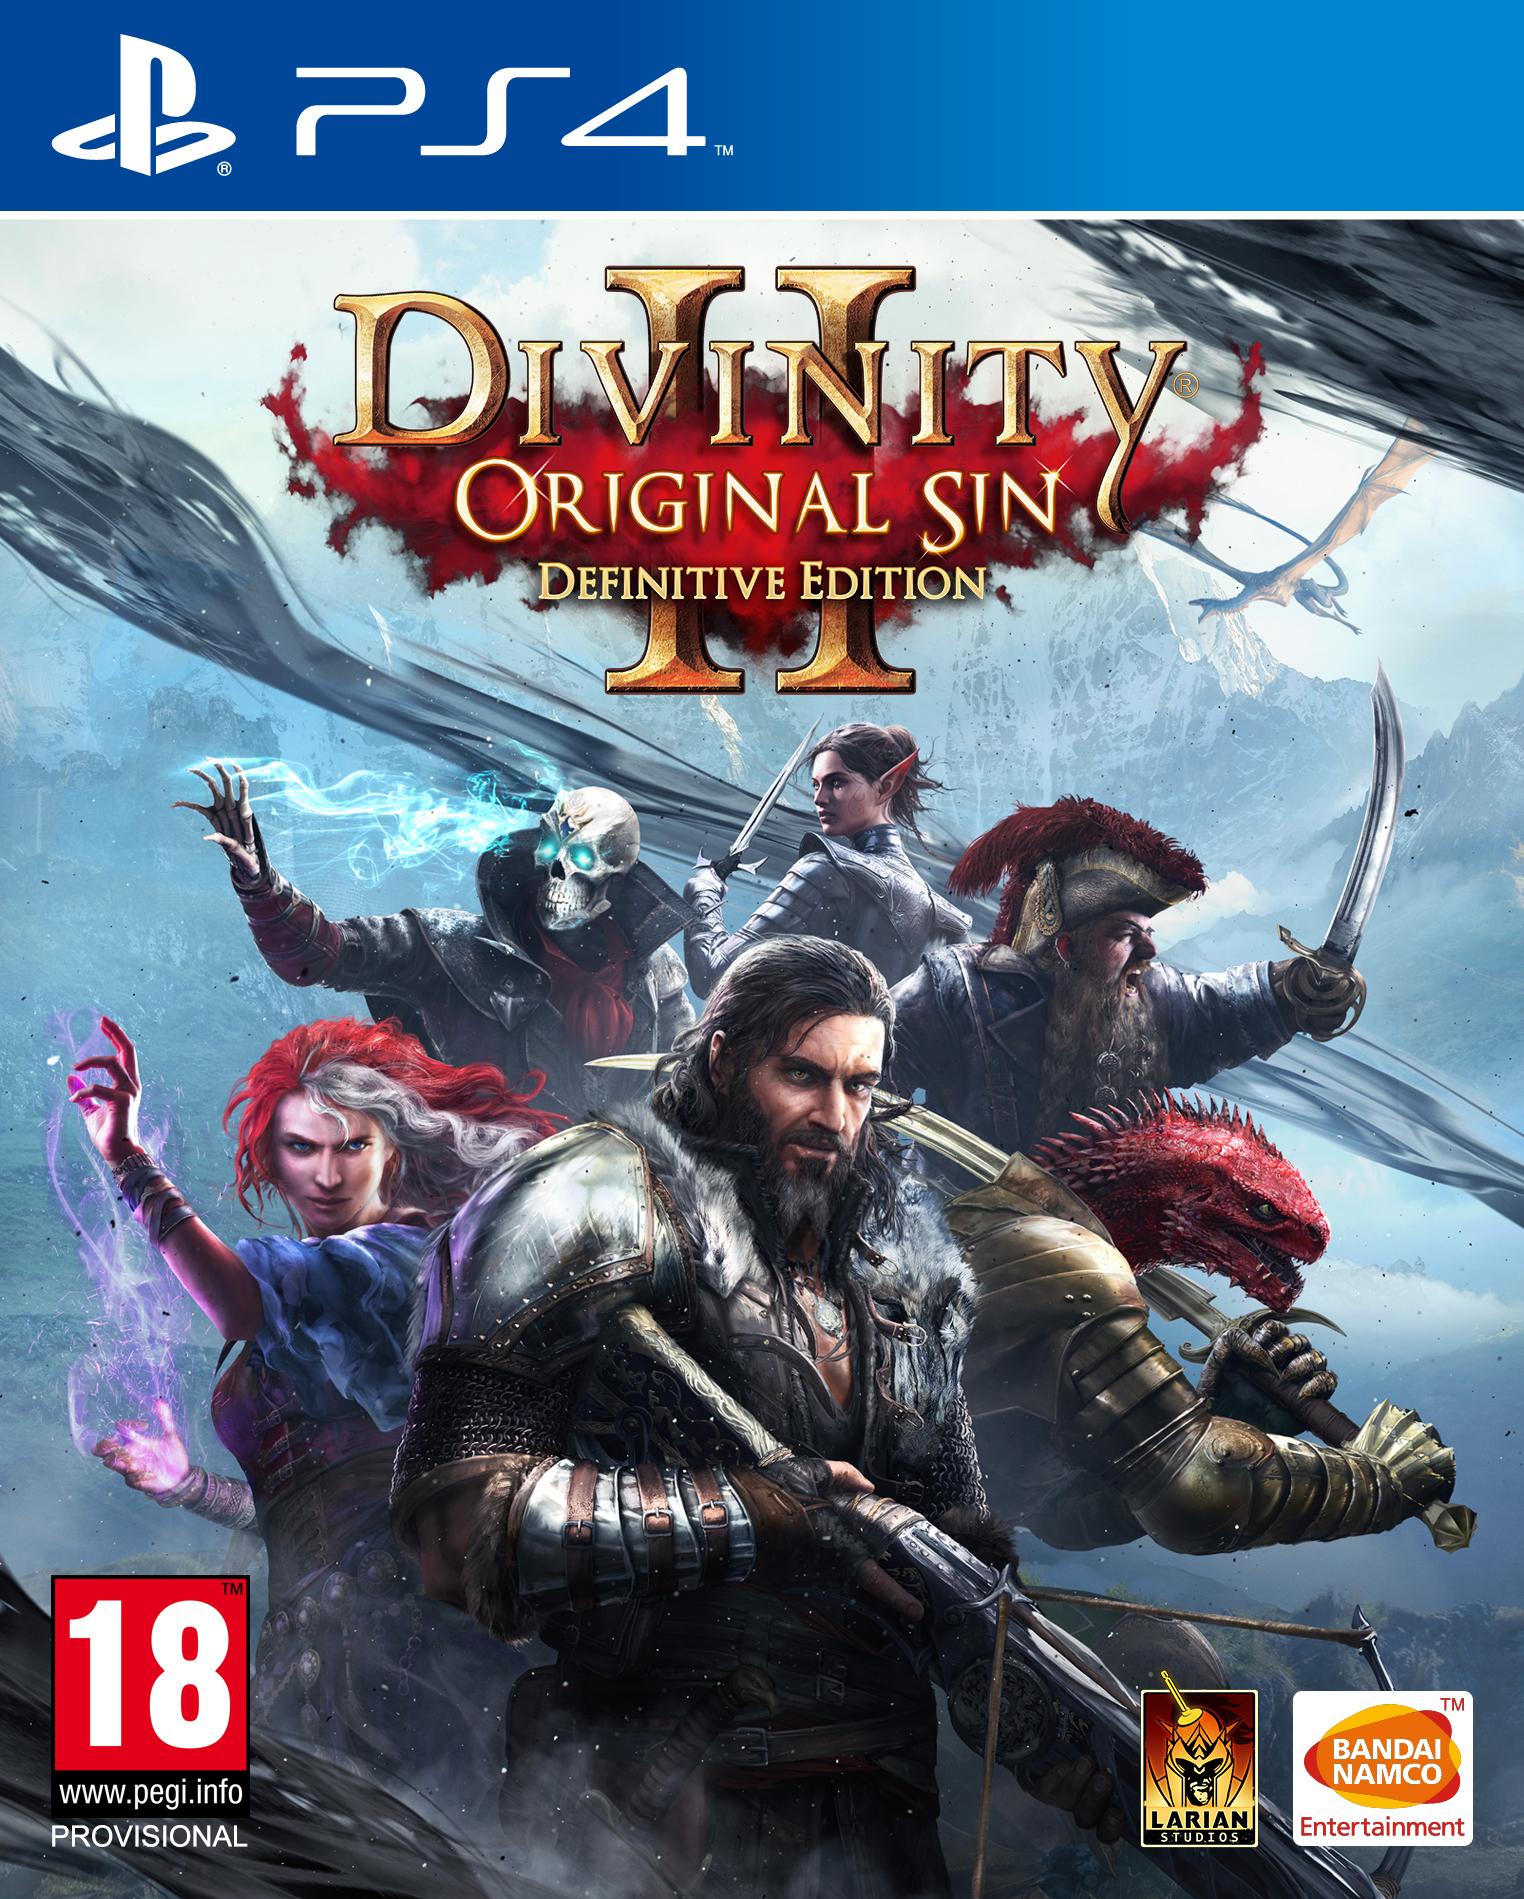 coolshop.co.uk - Divinity: Original Sin II – Definitive Edition